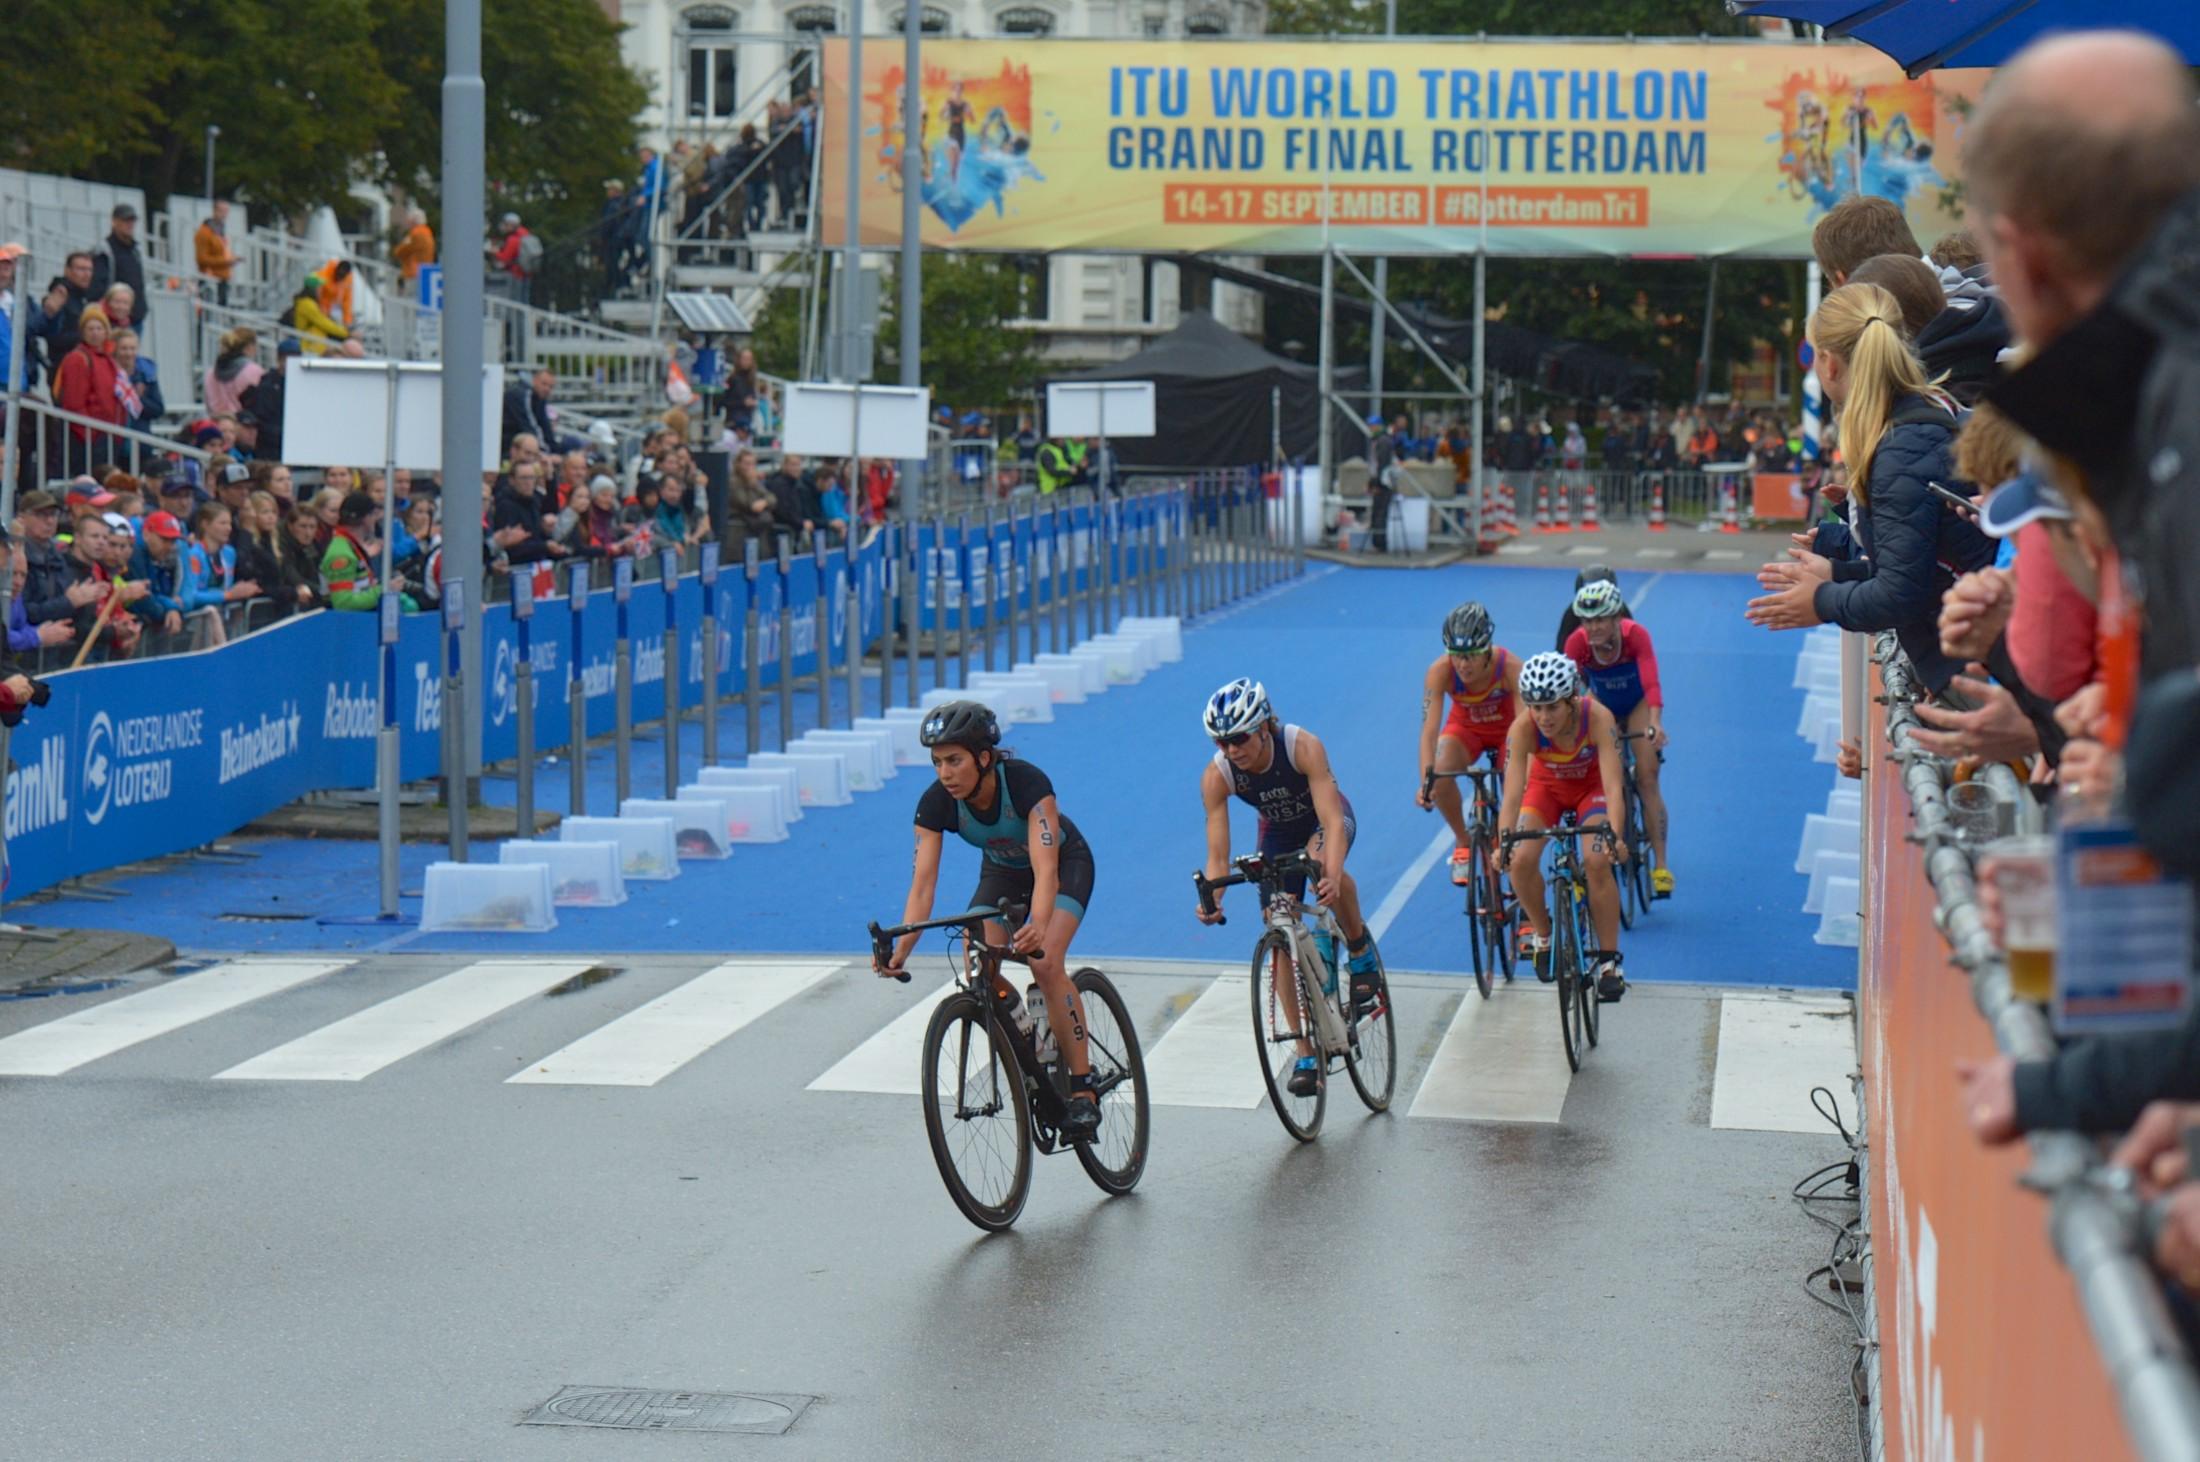 Worldchampionship Triathlon Rotterdam